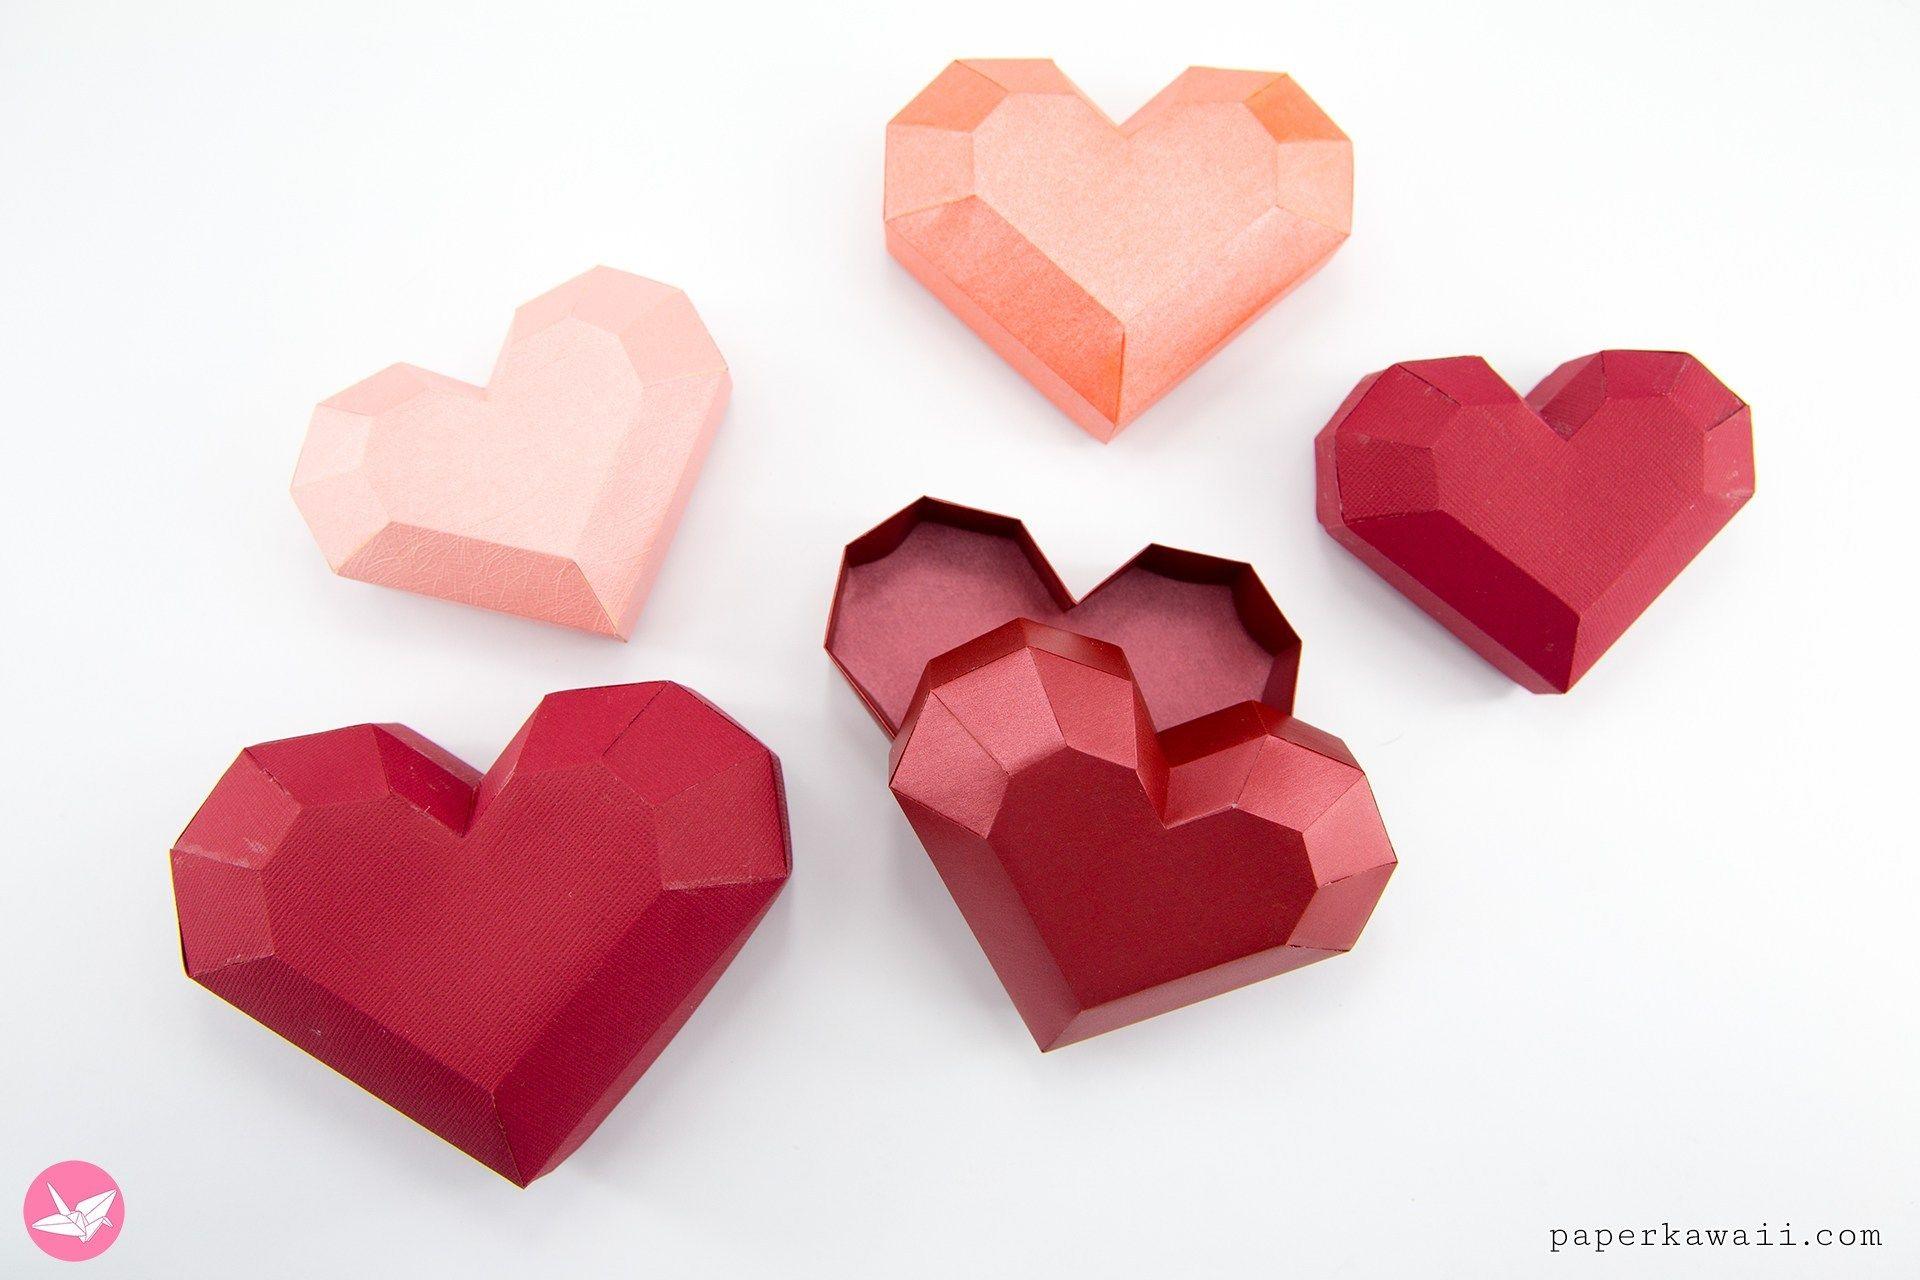 Paper Heart Box Tutorial Paper Kawaii Heart Box Heart Gift Box Paper Heart